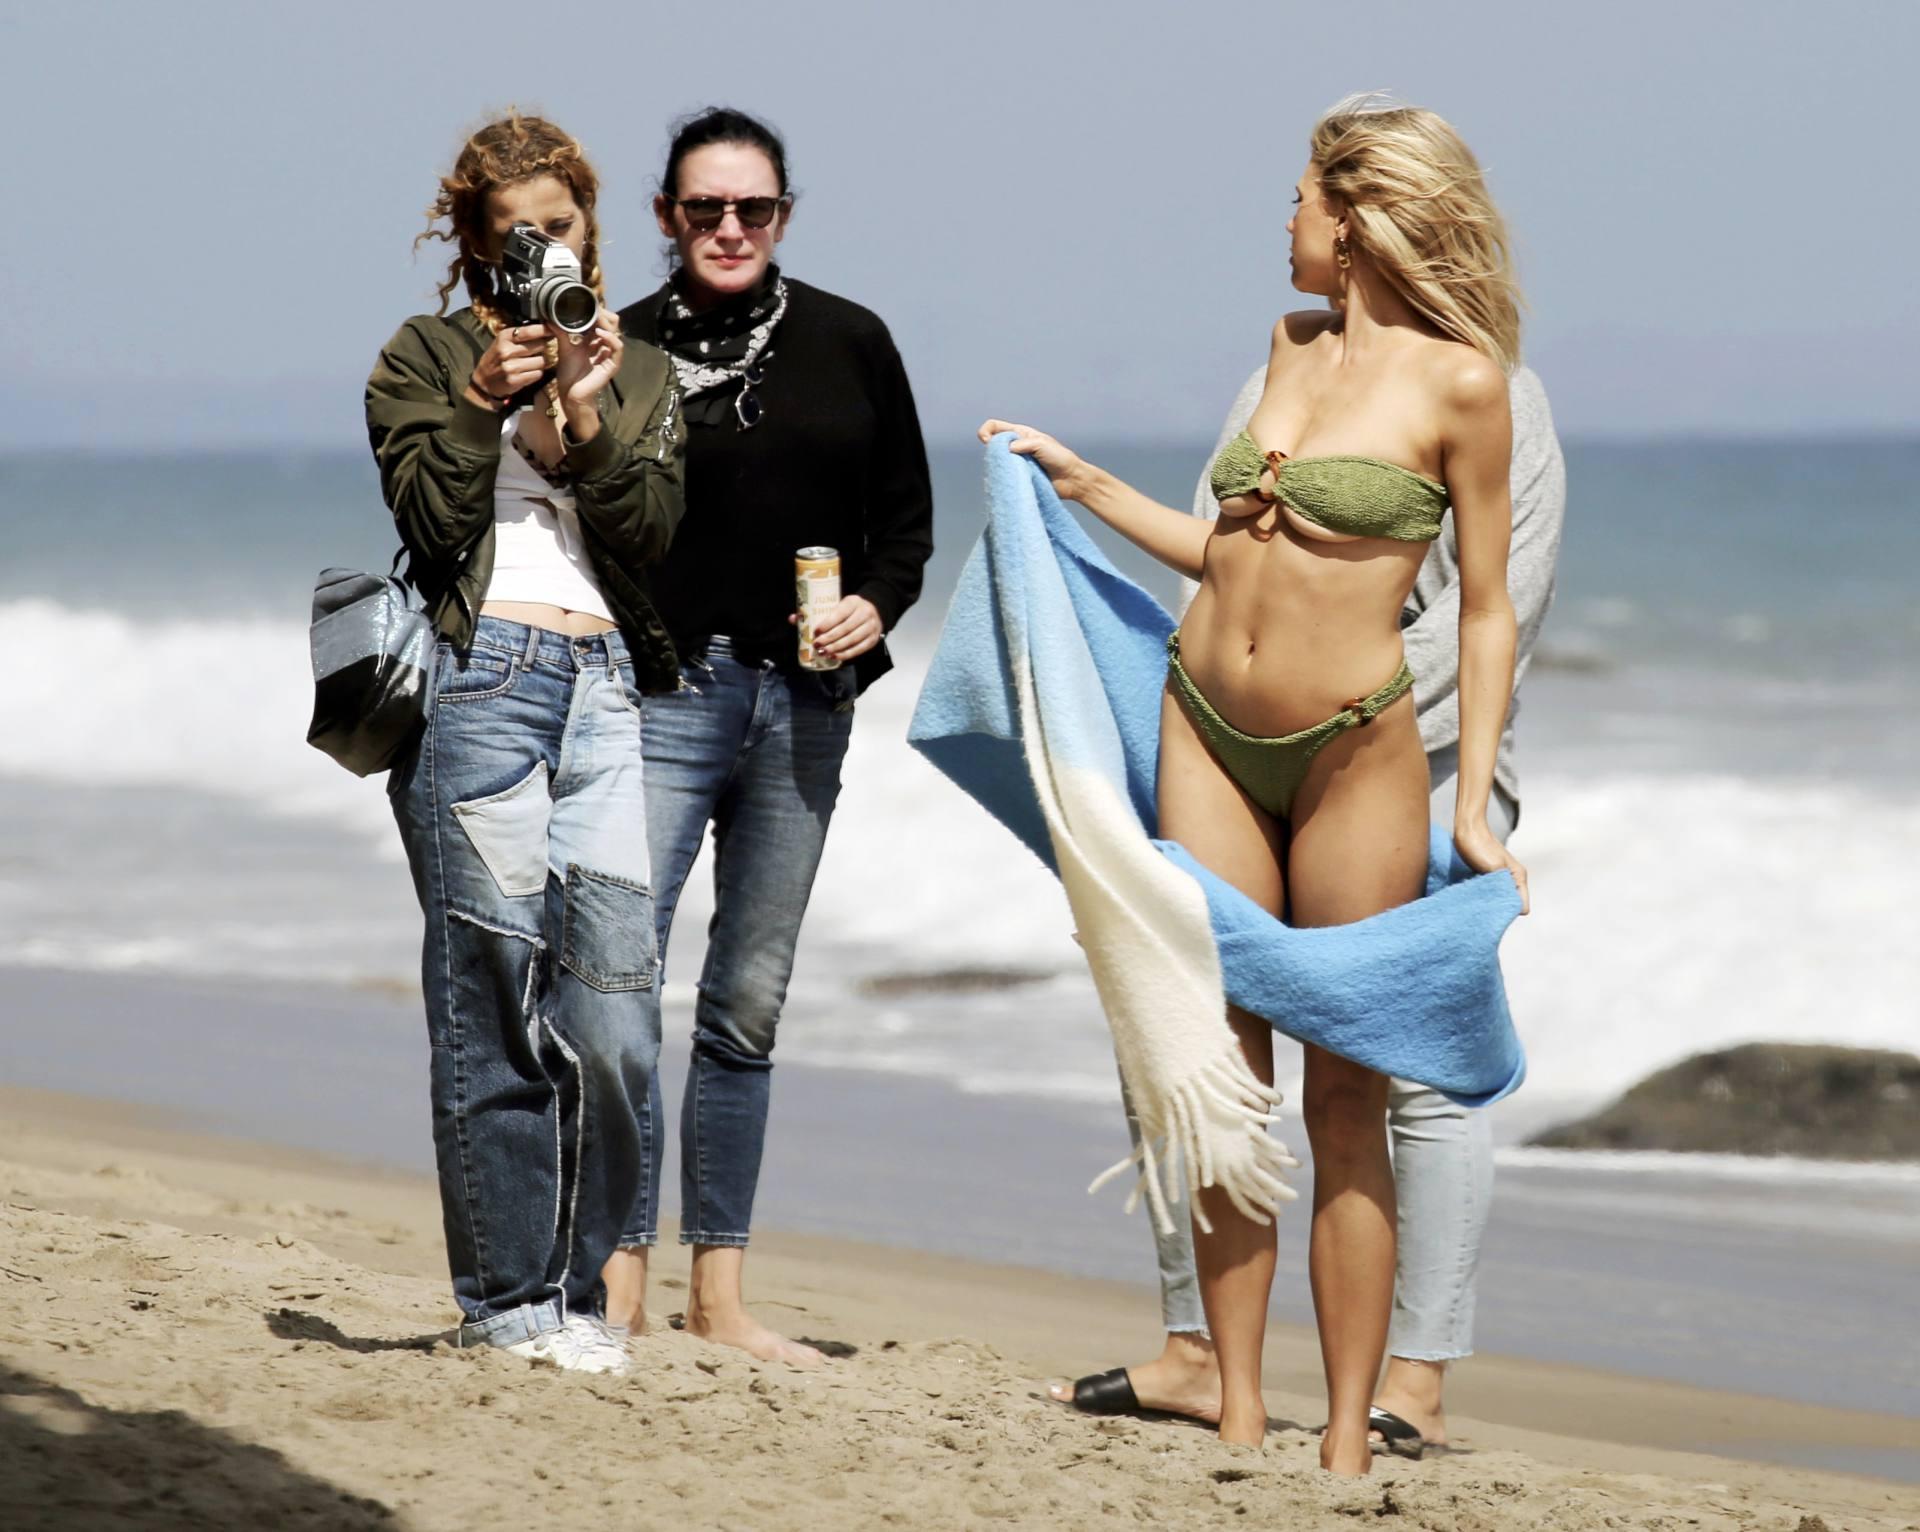 Charlotte Mckinney – Sexy Boobs In Tiny Bikini On The Beach In Los Angeles 0013